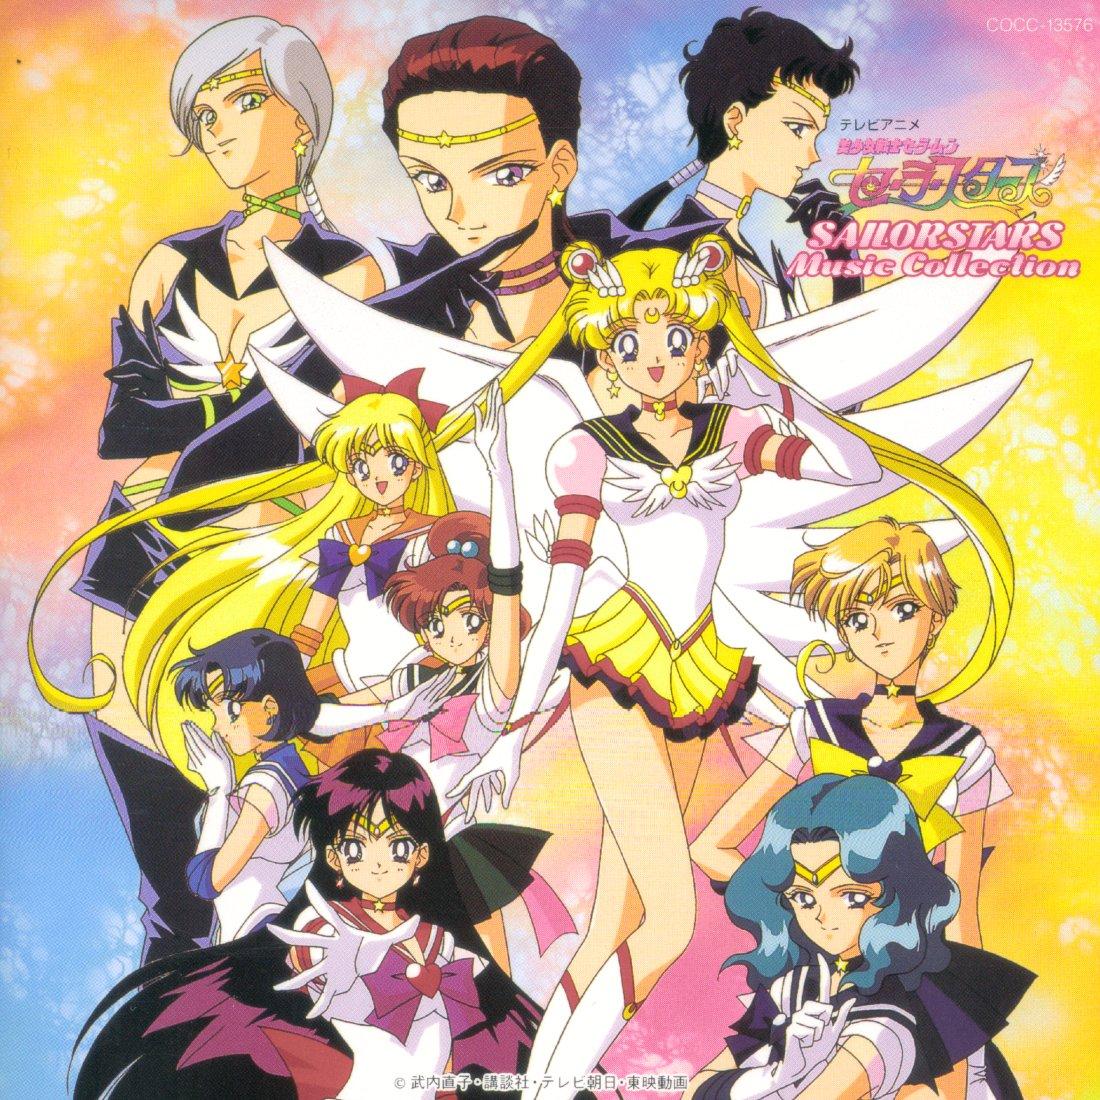 Sailor Moon Sailor Stars Music Collection